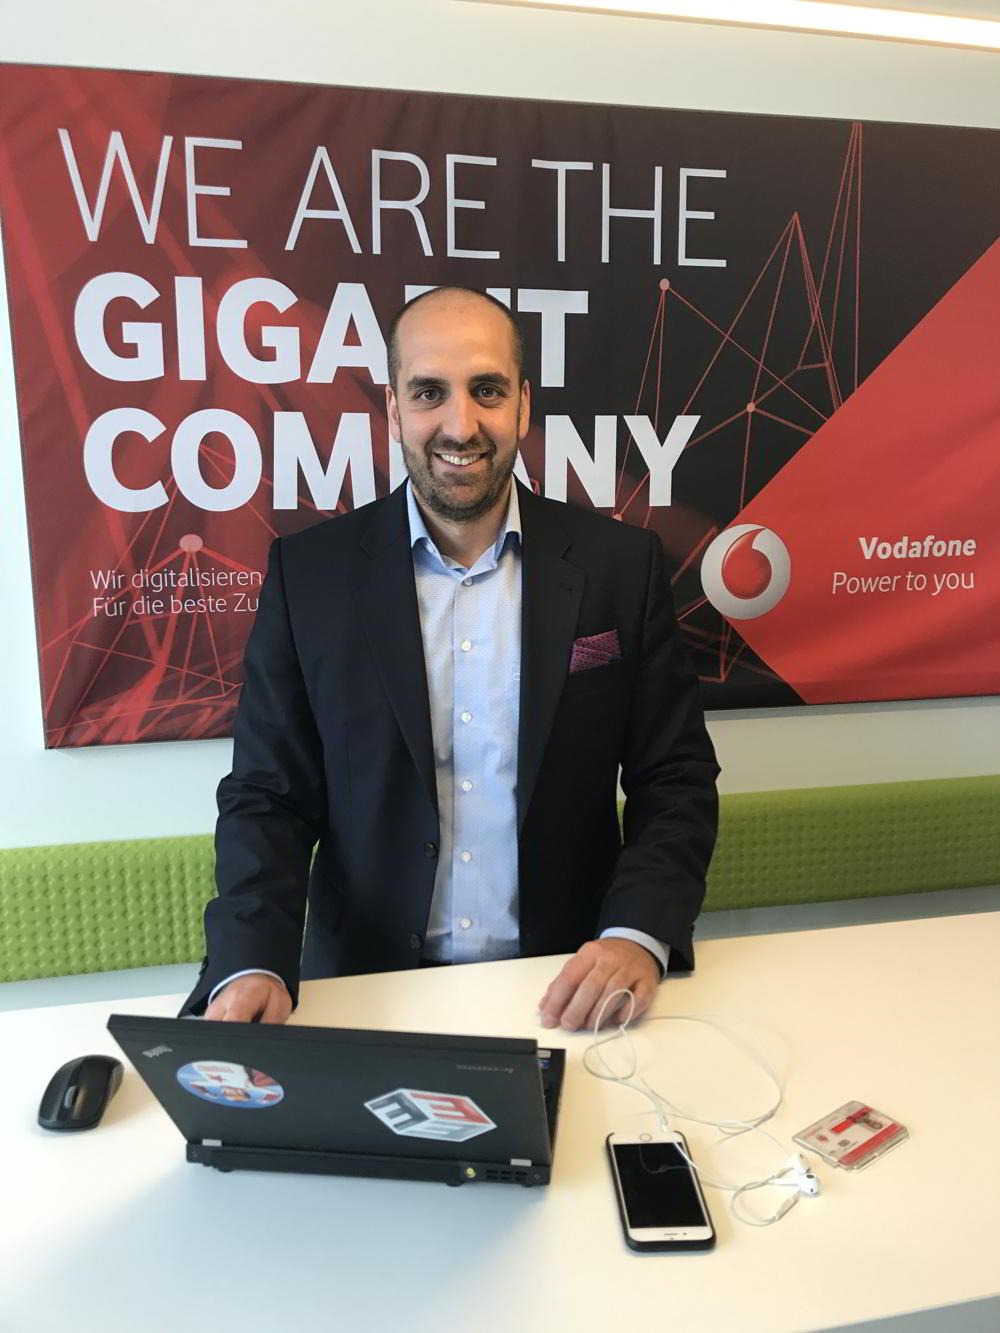 Richard Fels, Vodafone high potential, high potential vertrieb, berufseinstieg vertrieb